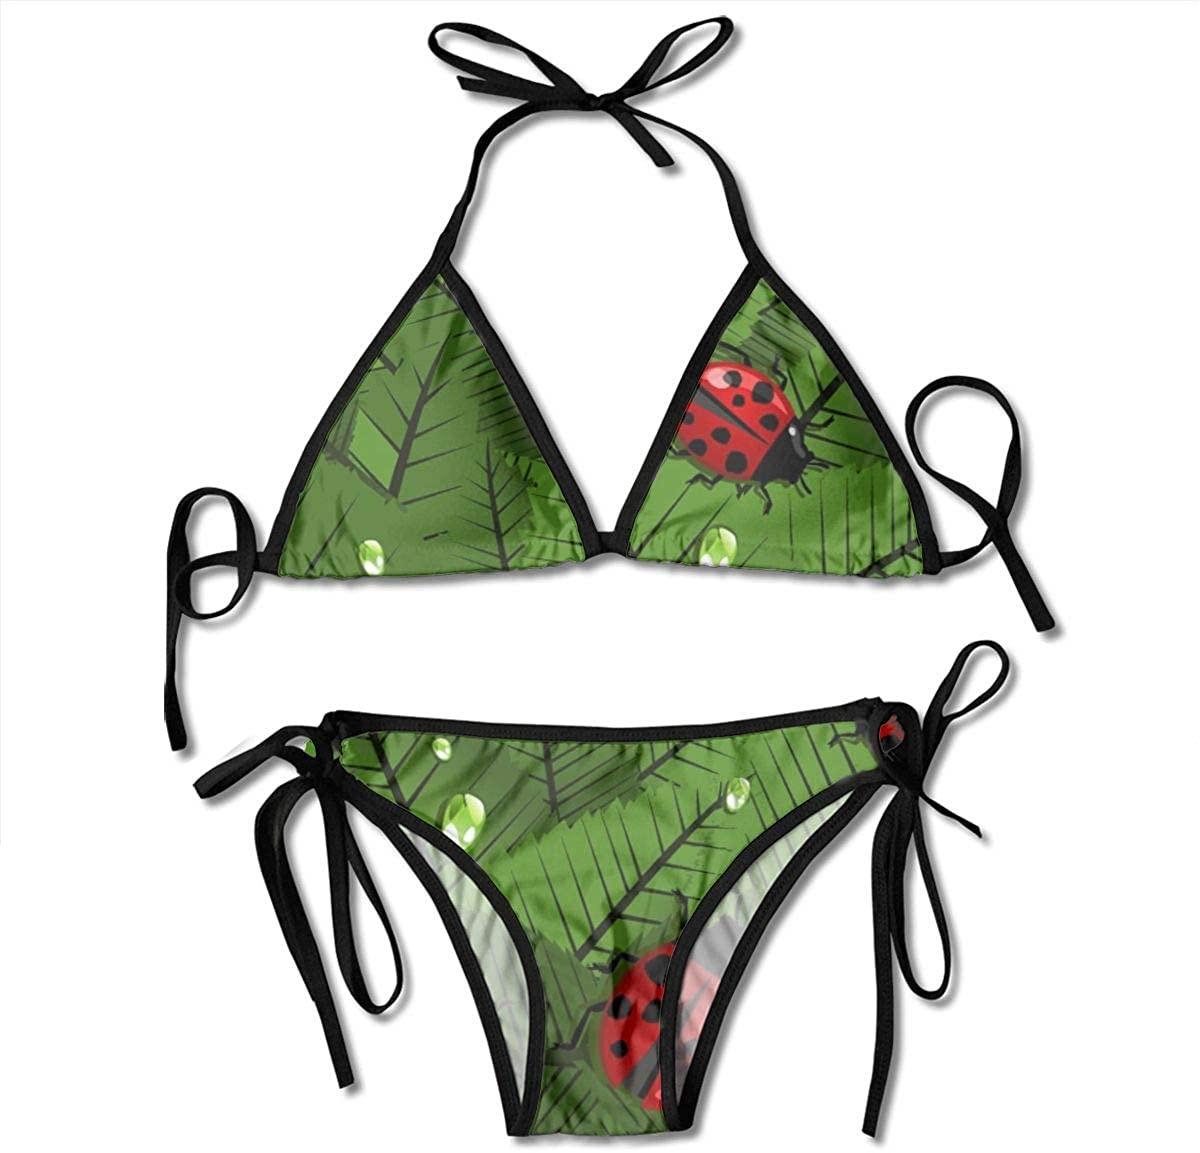 ZMagwa Women's String Triangle Bikini Set Two Piece Leaves and Ladybugs Swimsuit Black